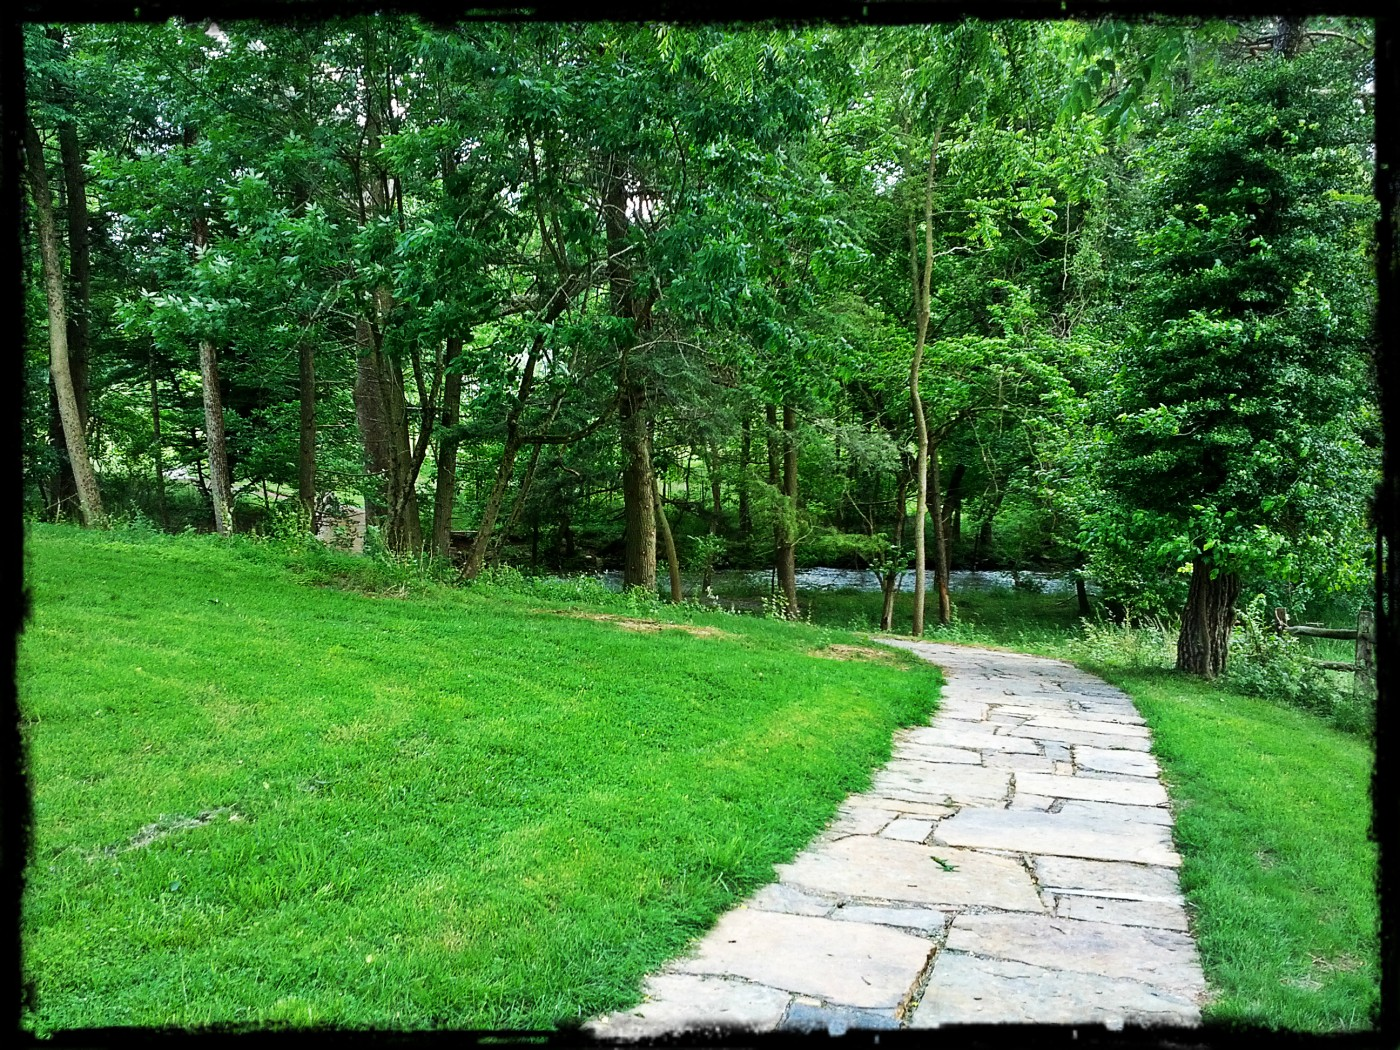 Walking path leading visitors' eyes